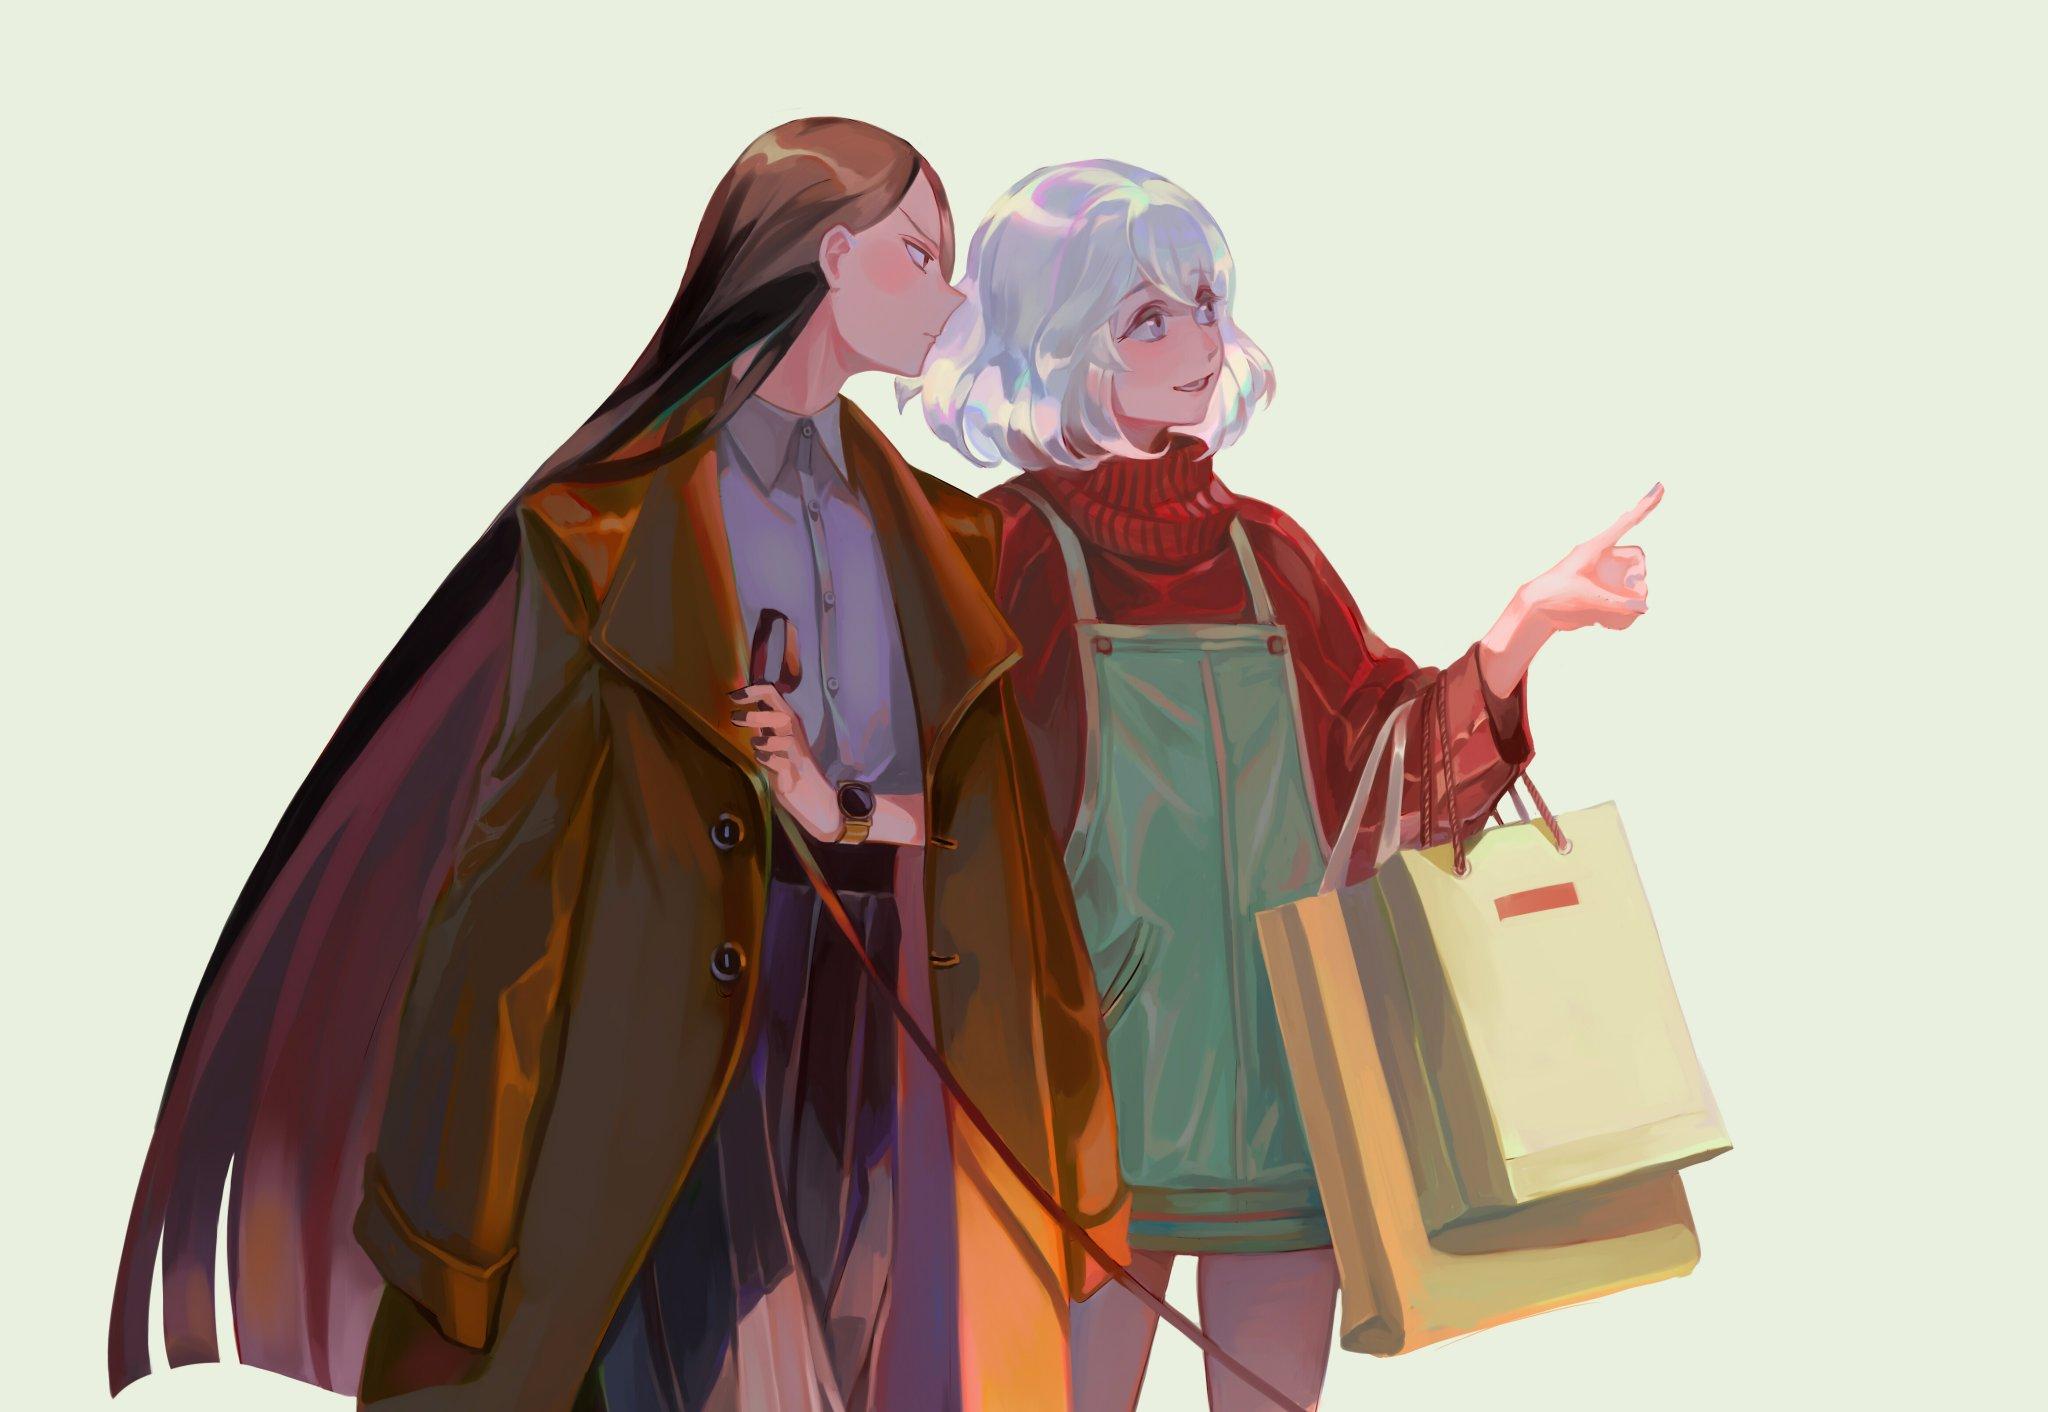 Anime 2048x1412 Houseki no kuni  jewels Diamond (Houseki no Kuni) Bort (Houseki no Kuni) long hair black hair short hair 2D simple background